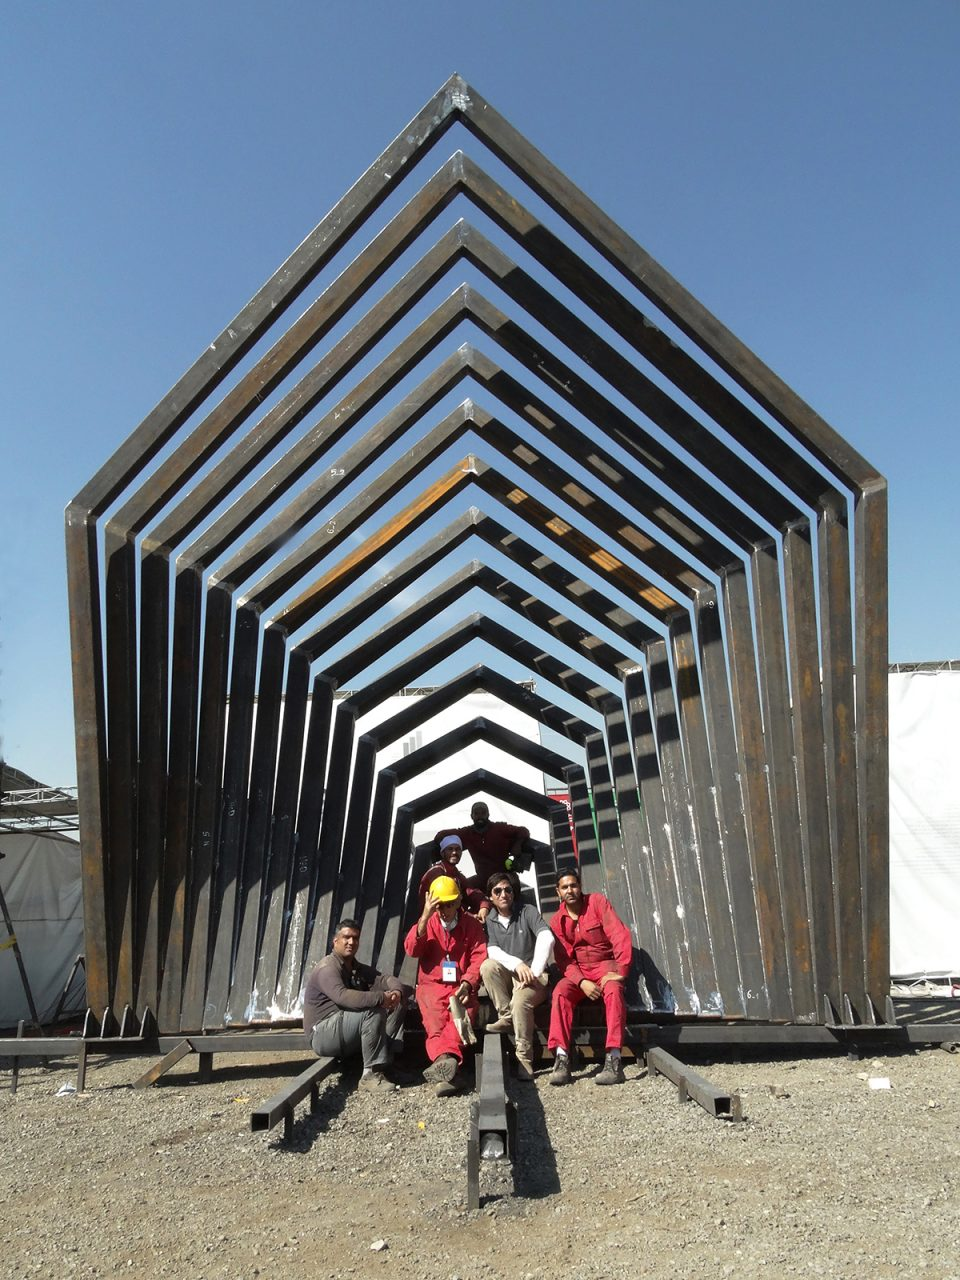 """CUBIC#51020161"", 2015, 640 x 400 x 544 cm, Steel, Tehran, Iran, Thierry Ferreira , arte, art, escultura, Sculpture, arquitetura, architecture, arte contemporanea, contemporary art, projecto, projet, project"